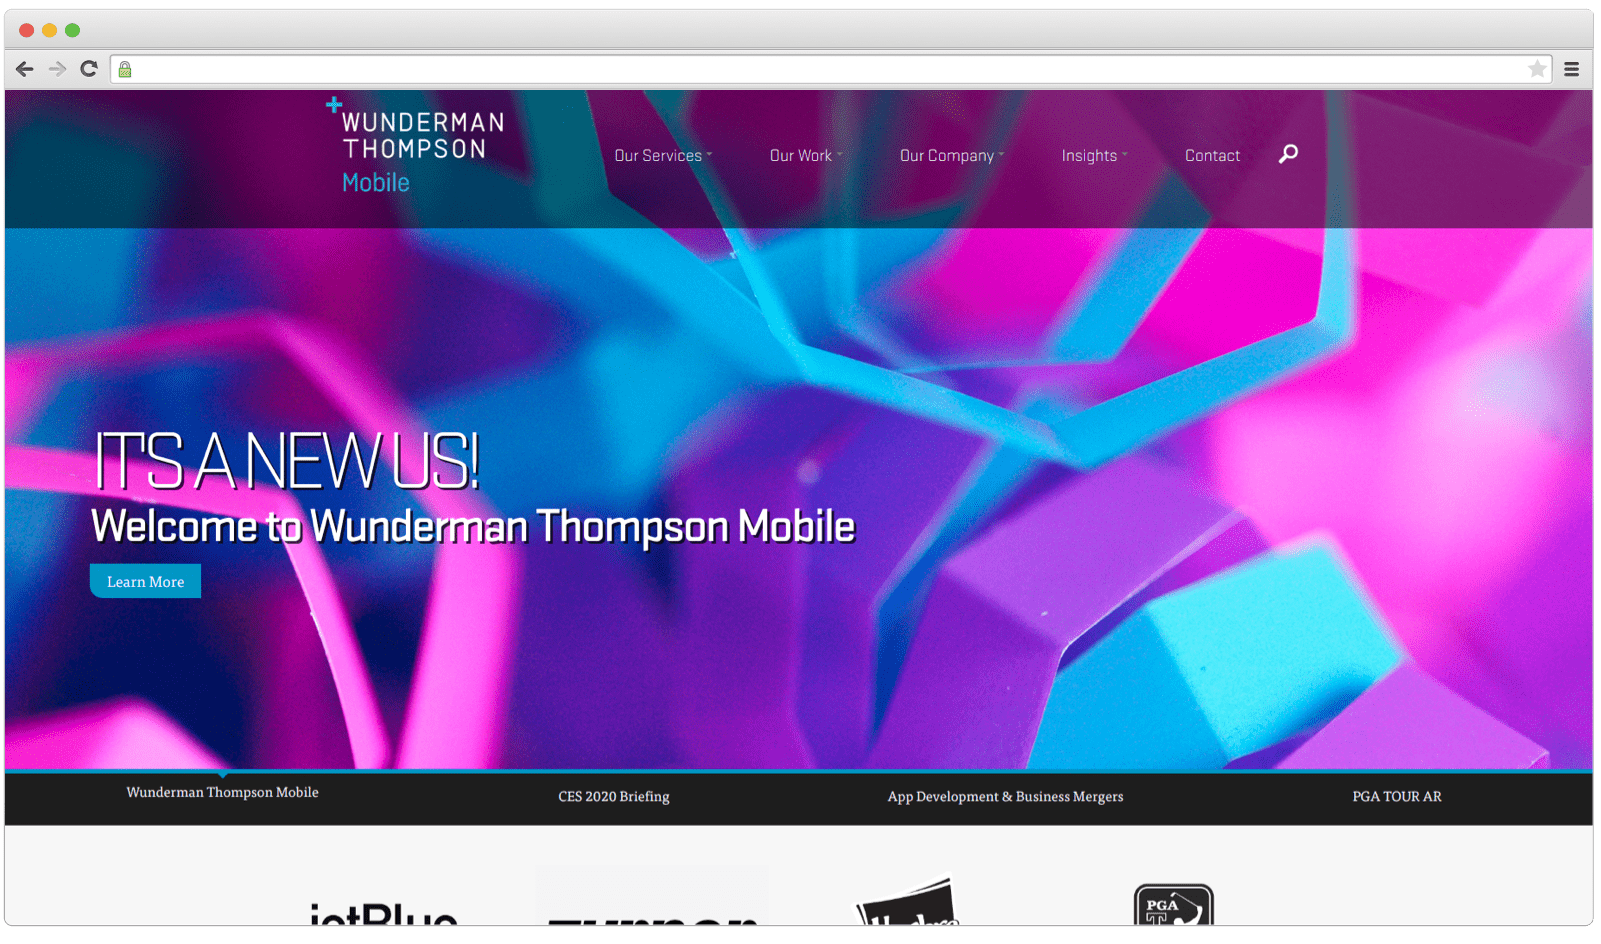 Wunderman Thompson Mobile